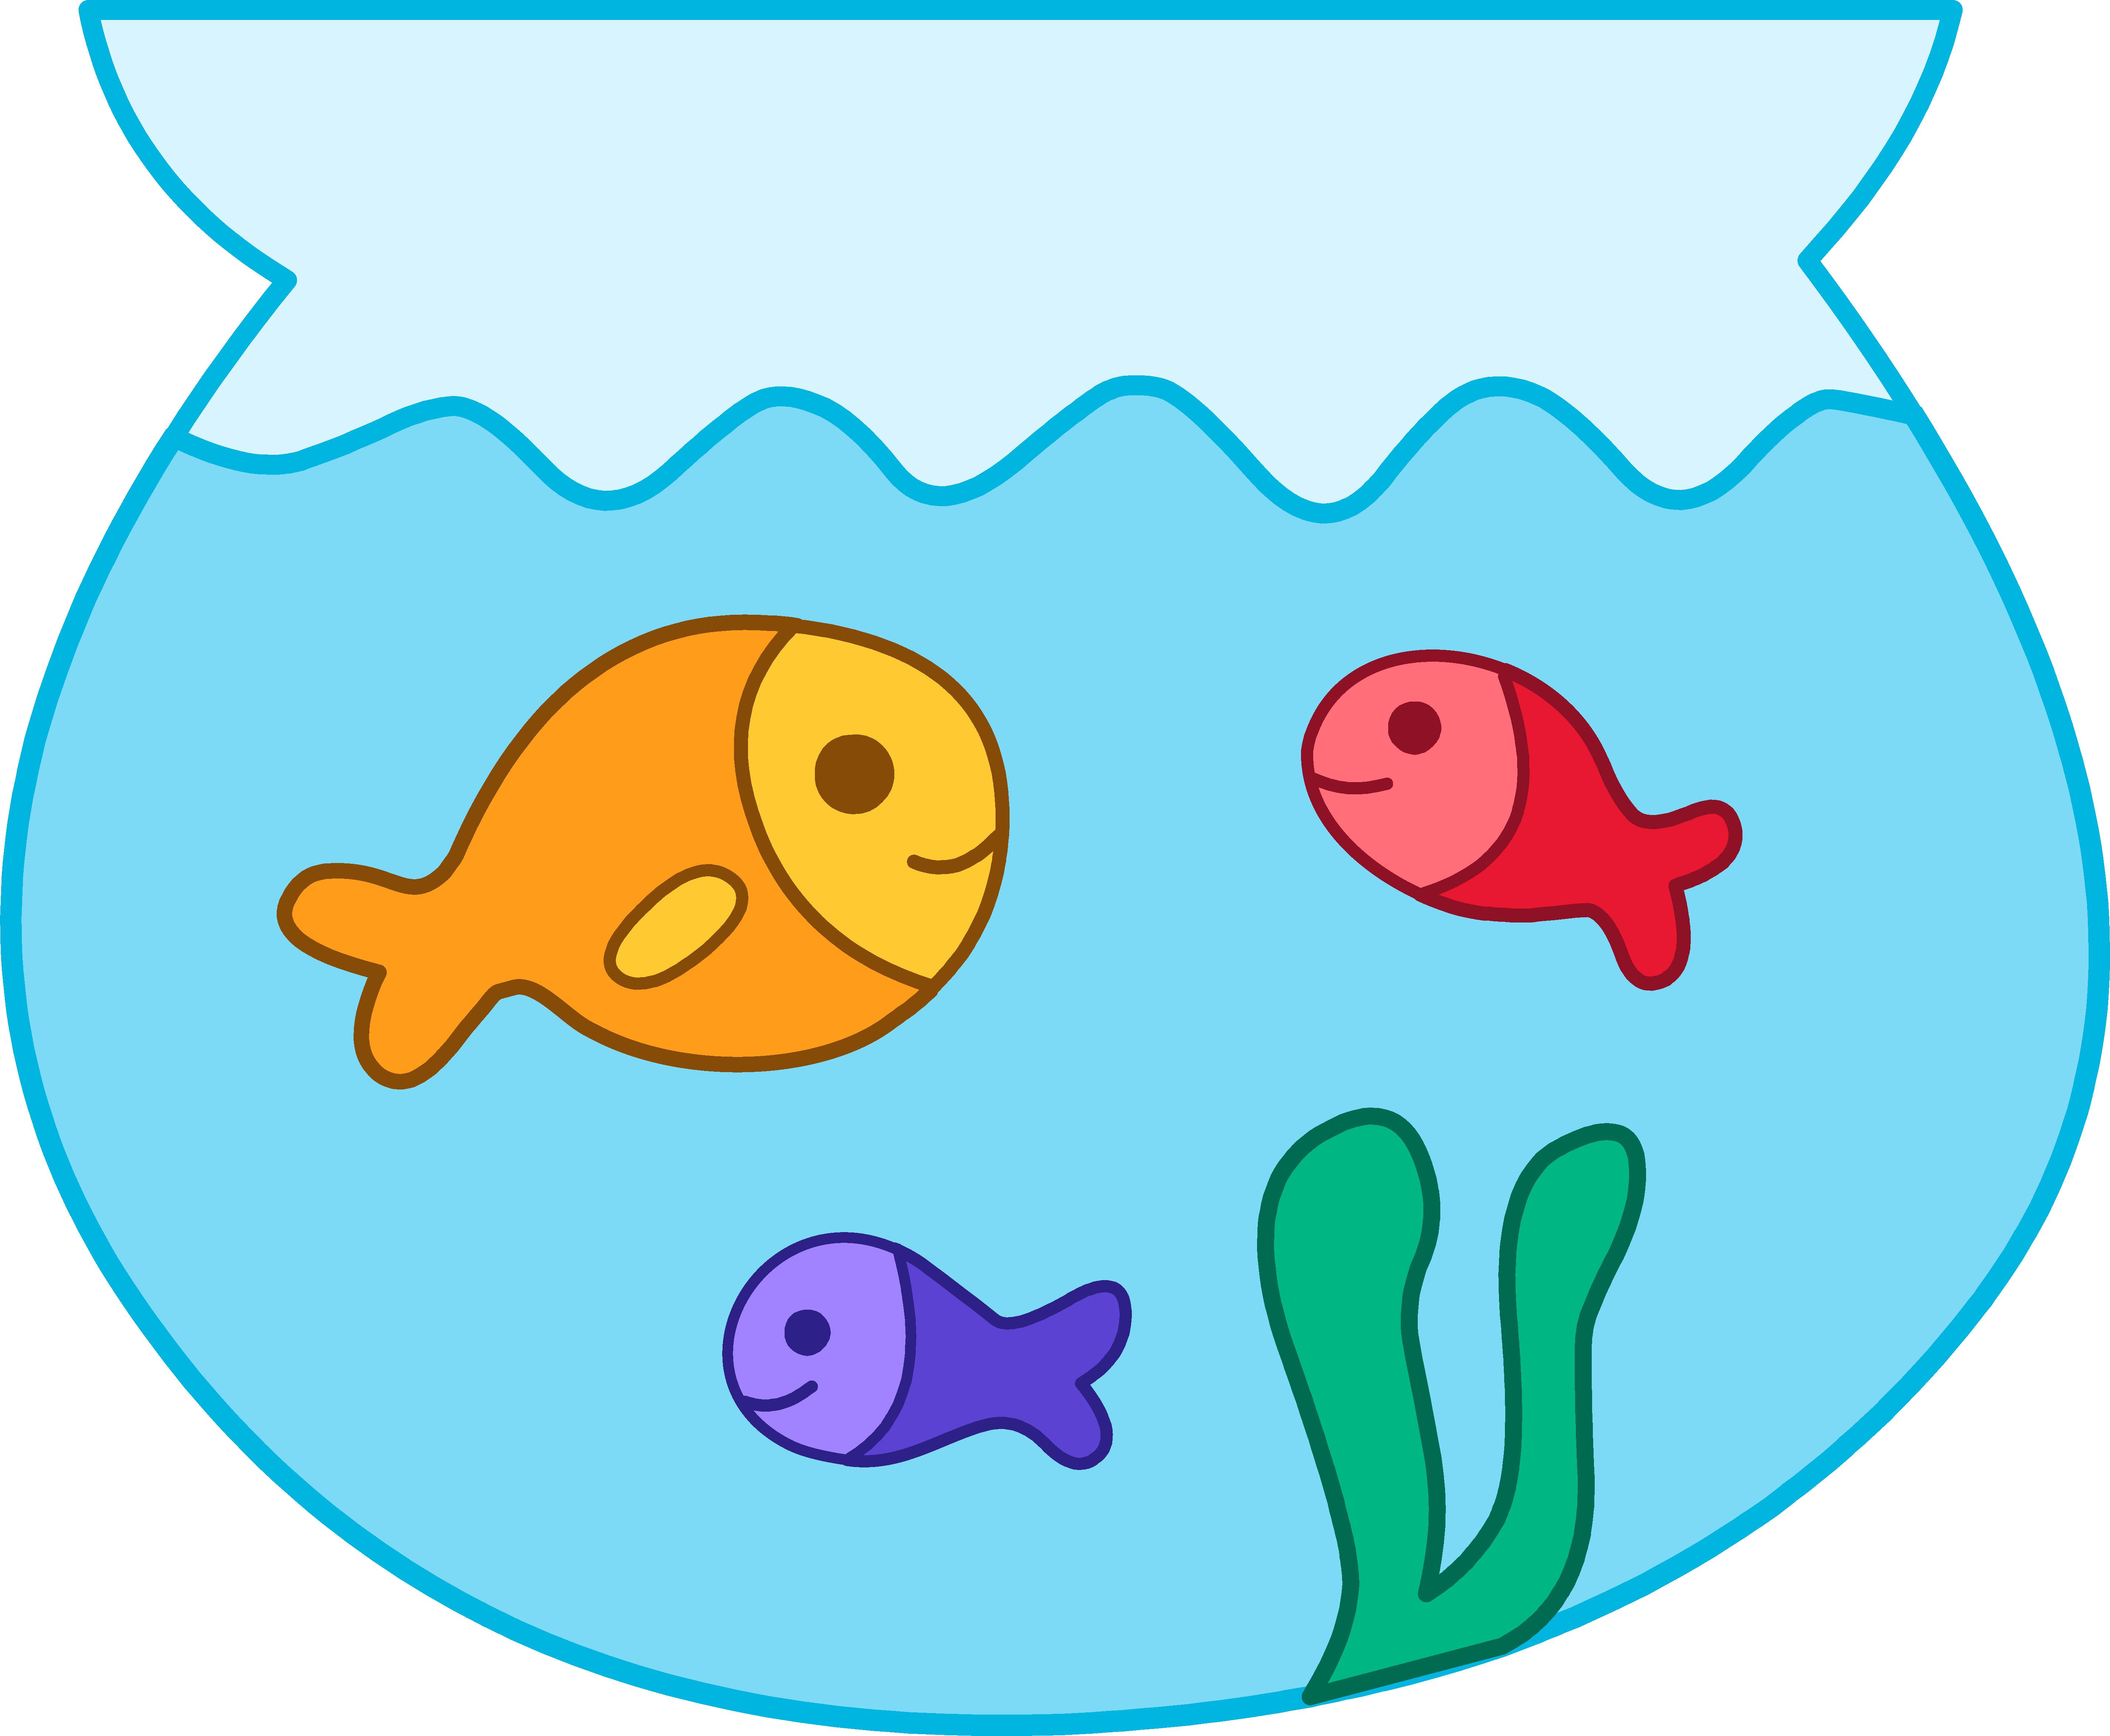 Line Art clipart fish bowl Bowl art download clipart Fishbowl